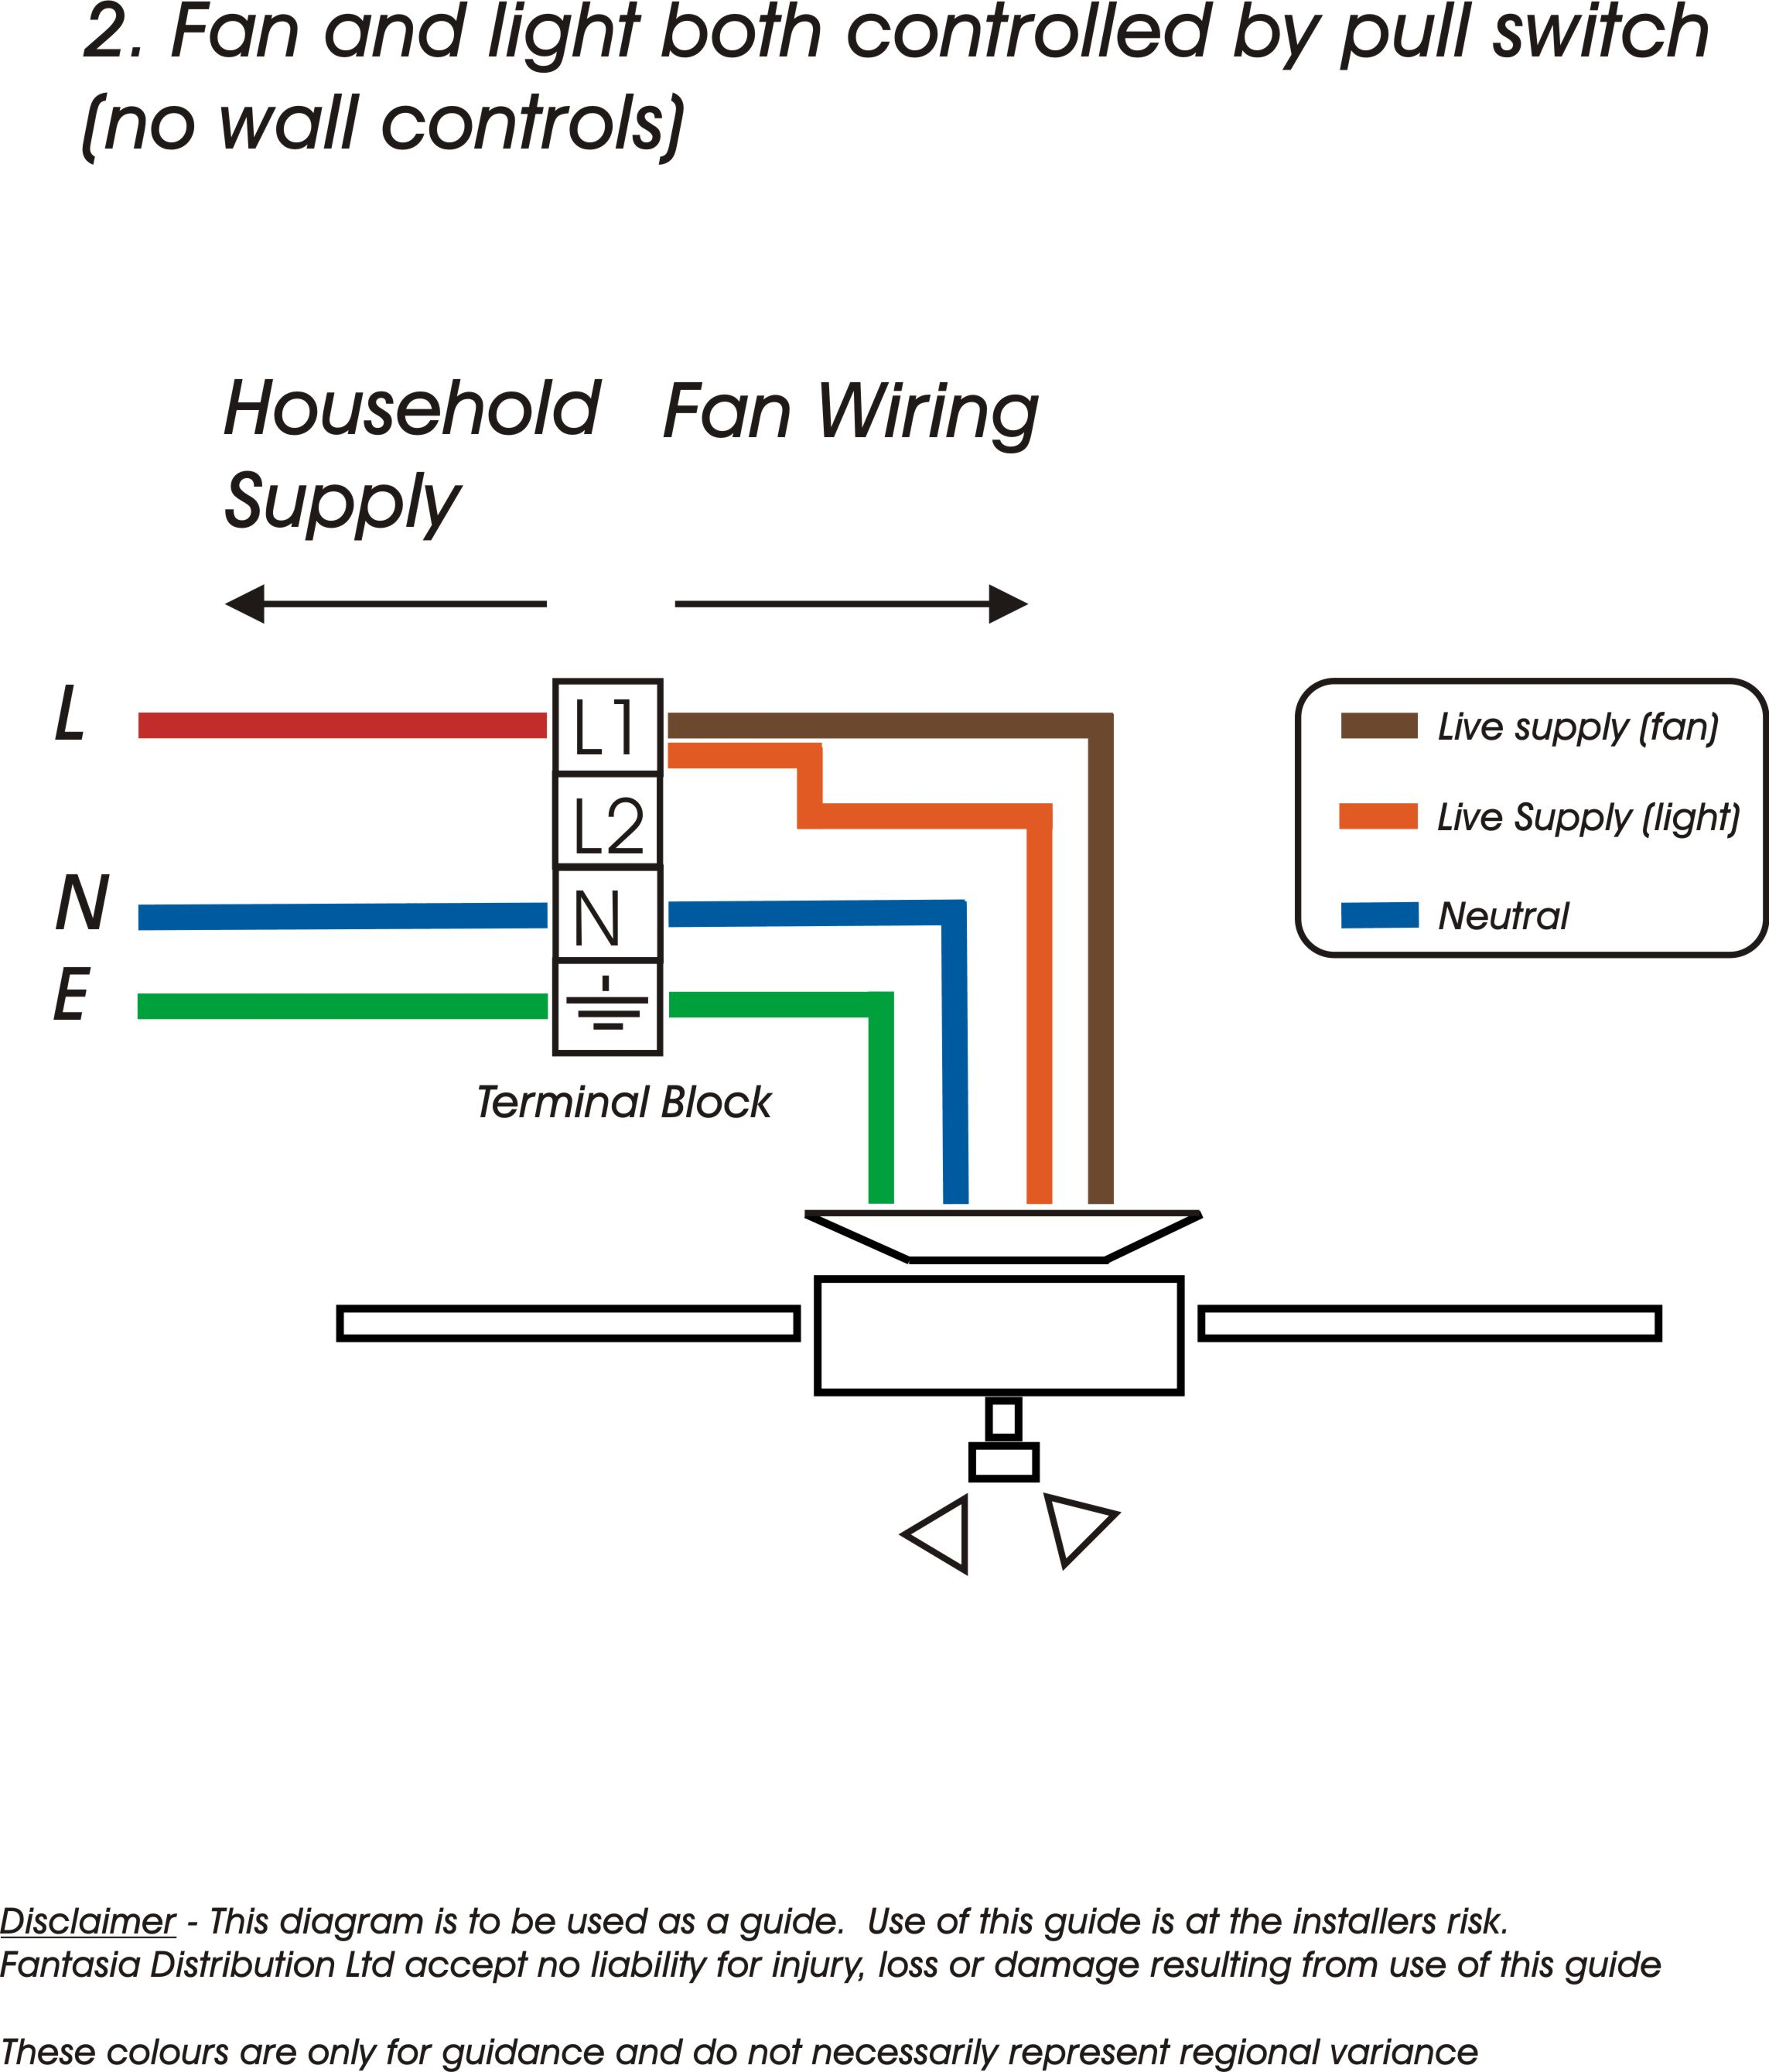 Fantasia Fans | Fantasia Ceiling Fans Wiring Information - Wiring Diagram For Ceiling Fan